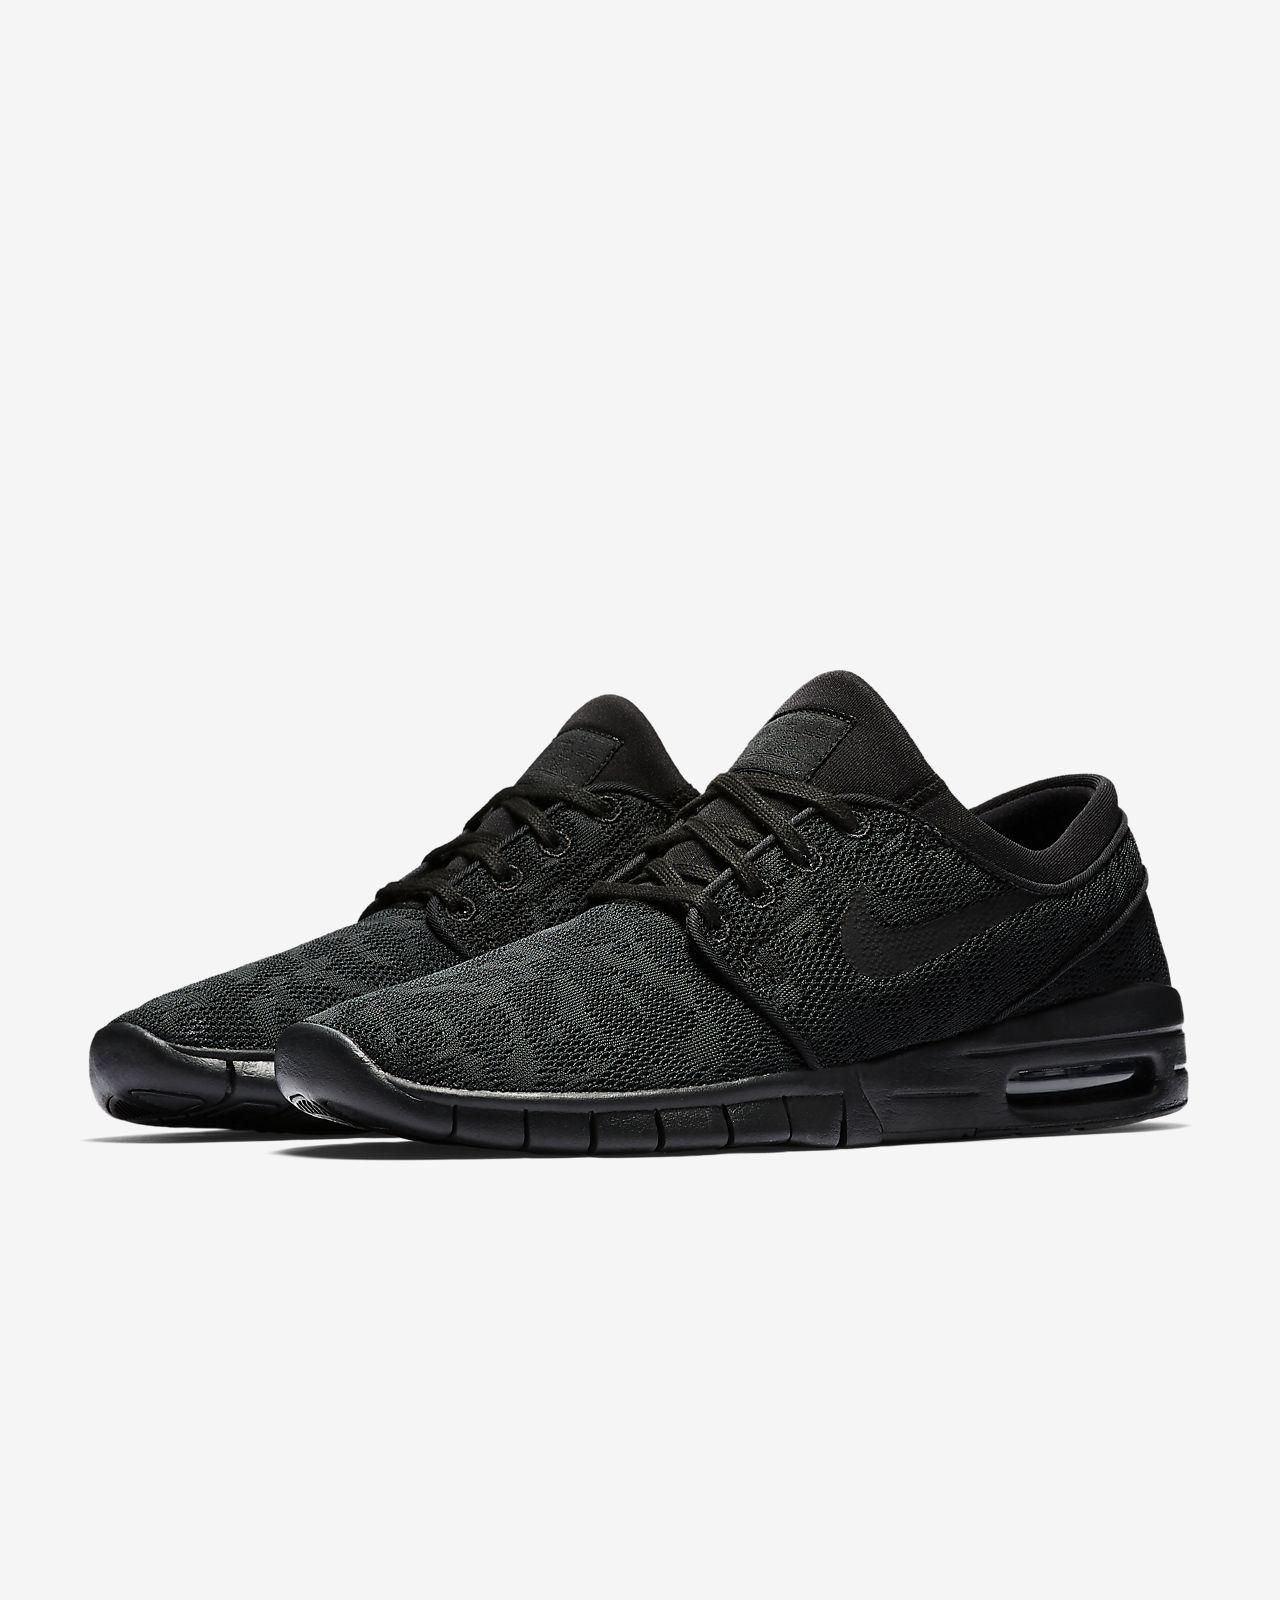 info for 6e8ae 52106 ... Nike SB Stefan Janoski Max Skate Shoe